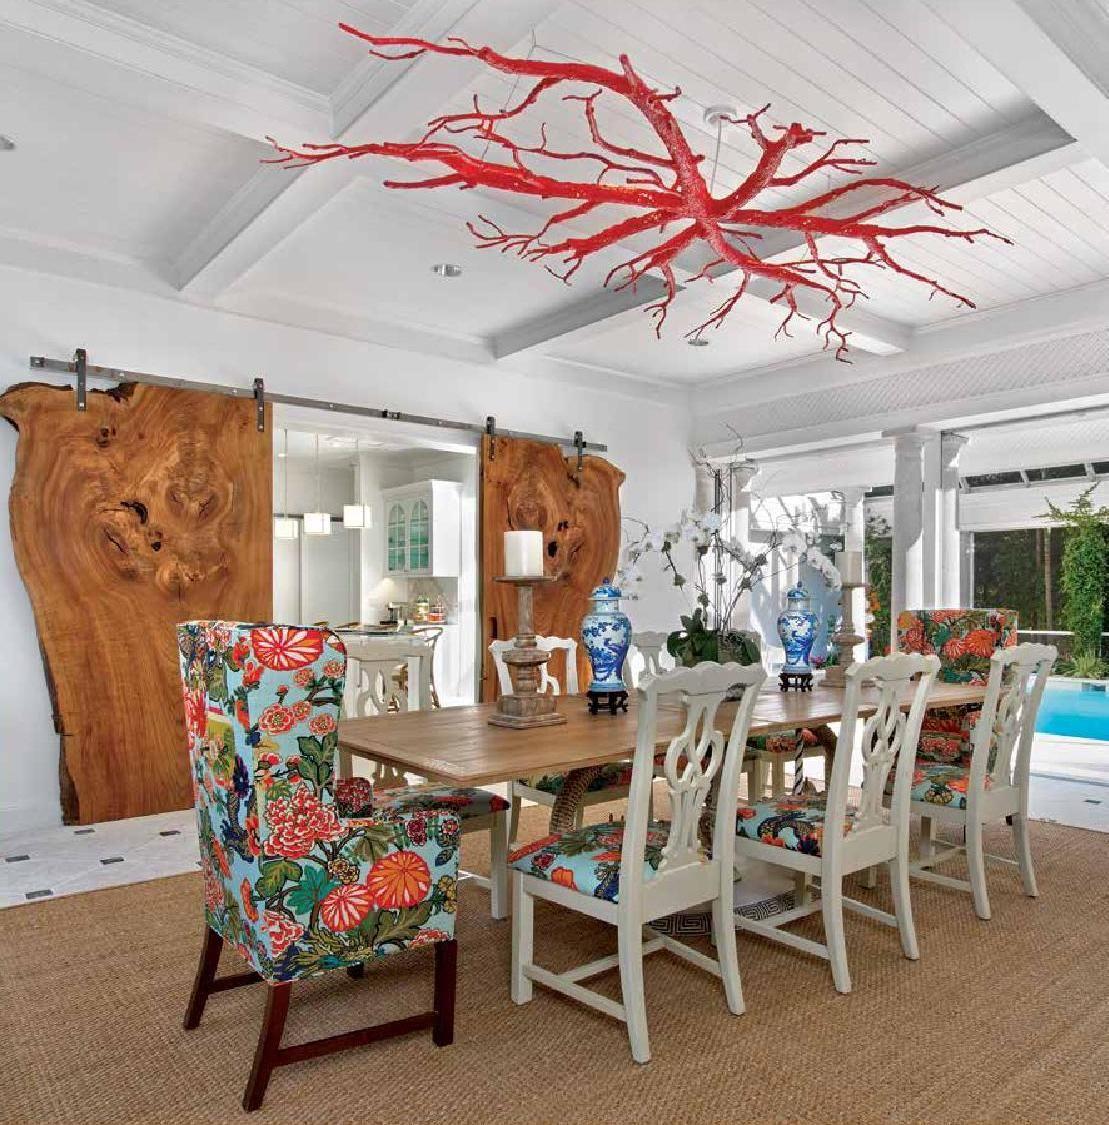 #ClippedOnIssuu from Home & Design Magazine | Design Issue 2014 | Southwest Florida Edition